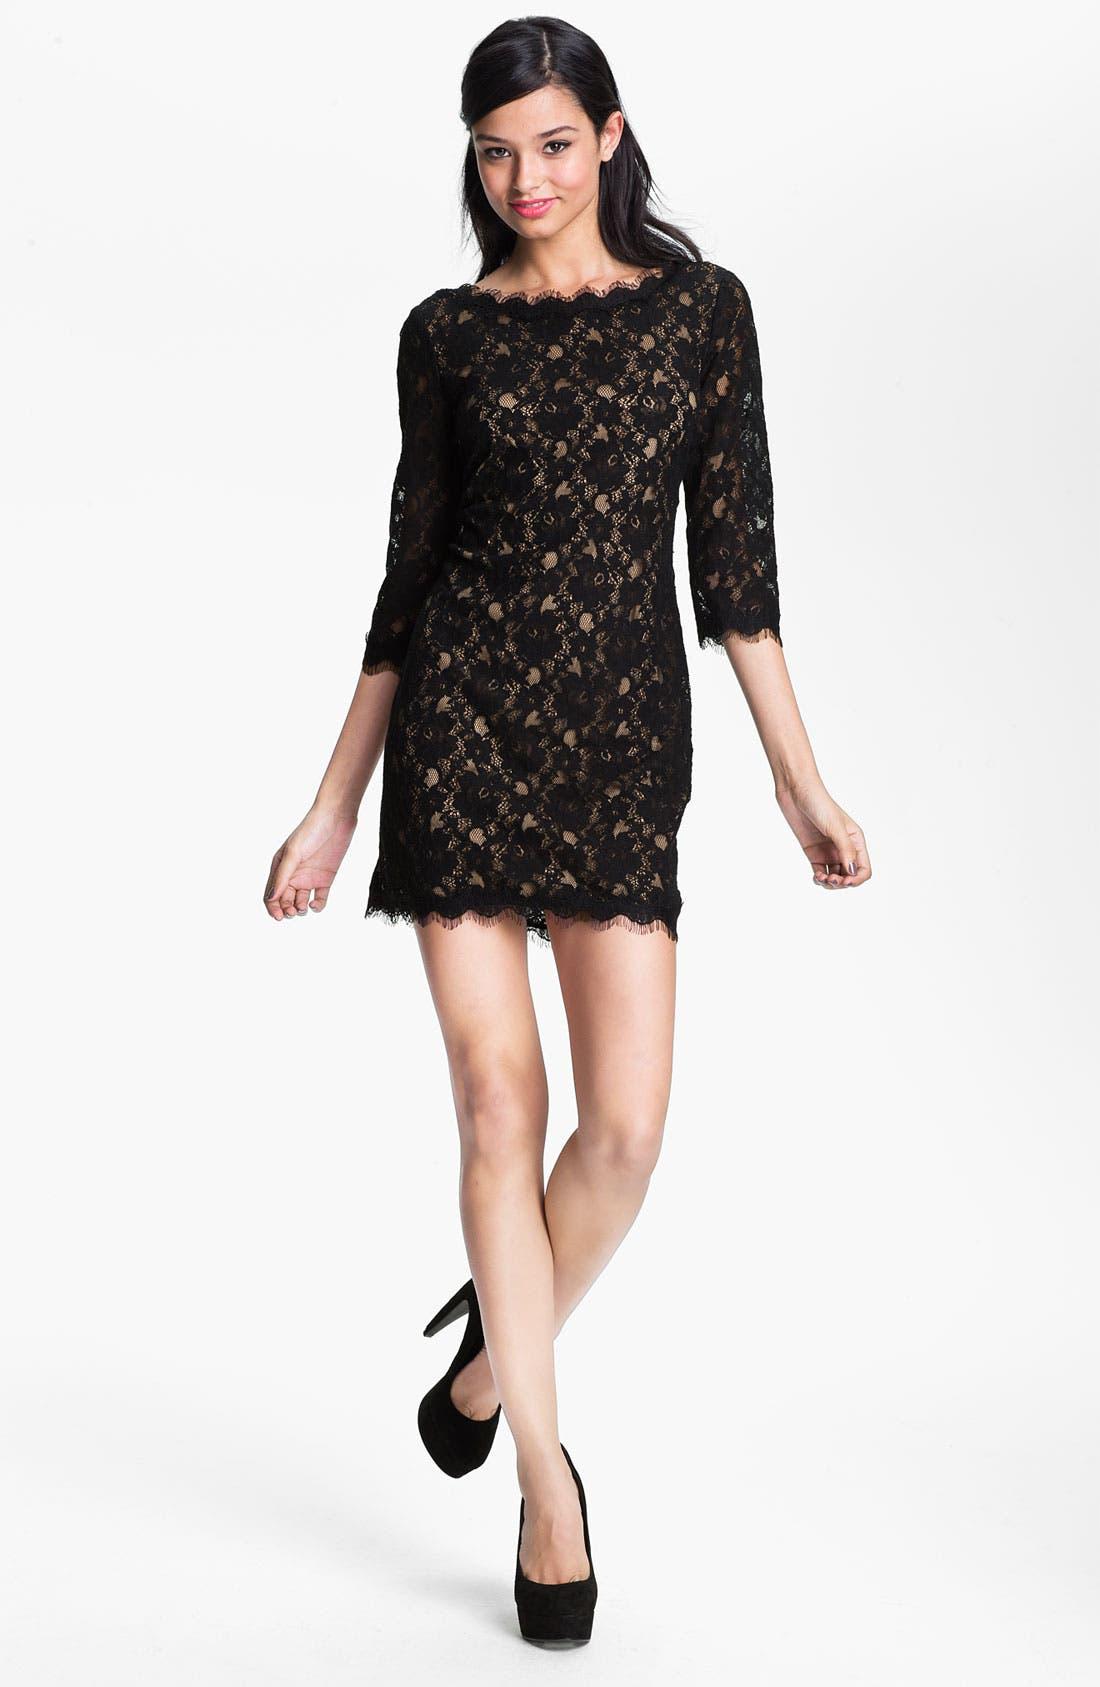 Alternate Image 1 Selected - Lush Lace Shift Dress (Juniors)